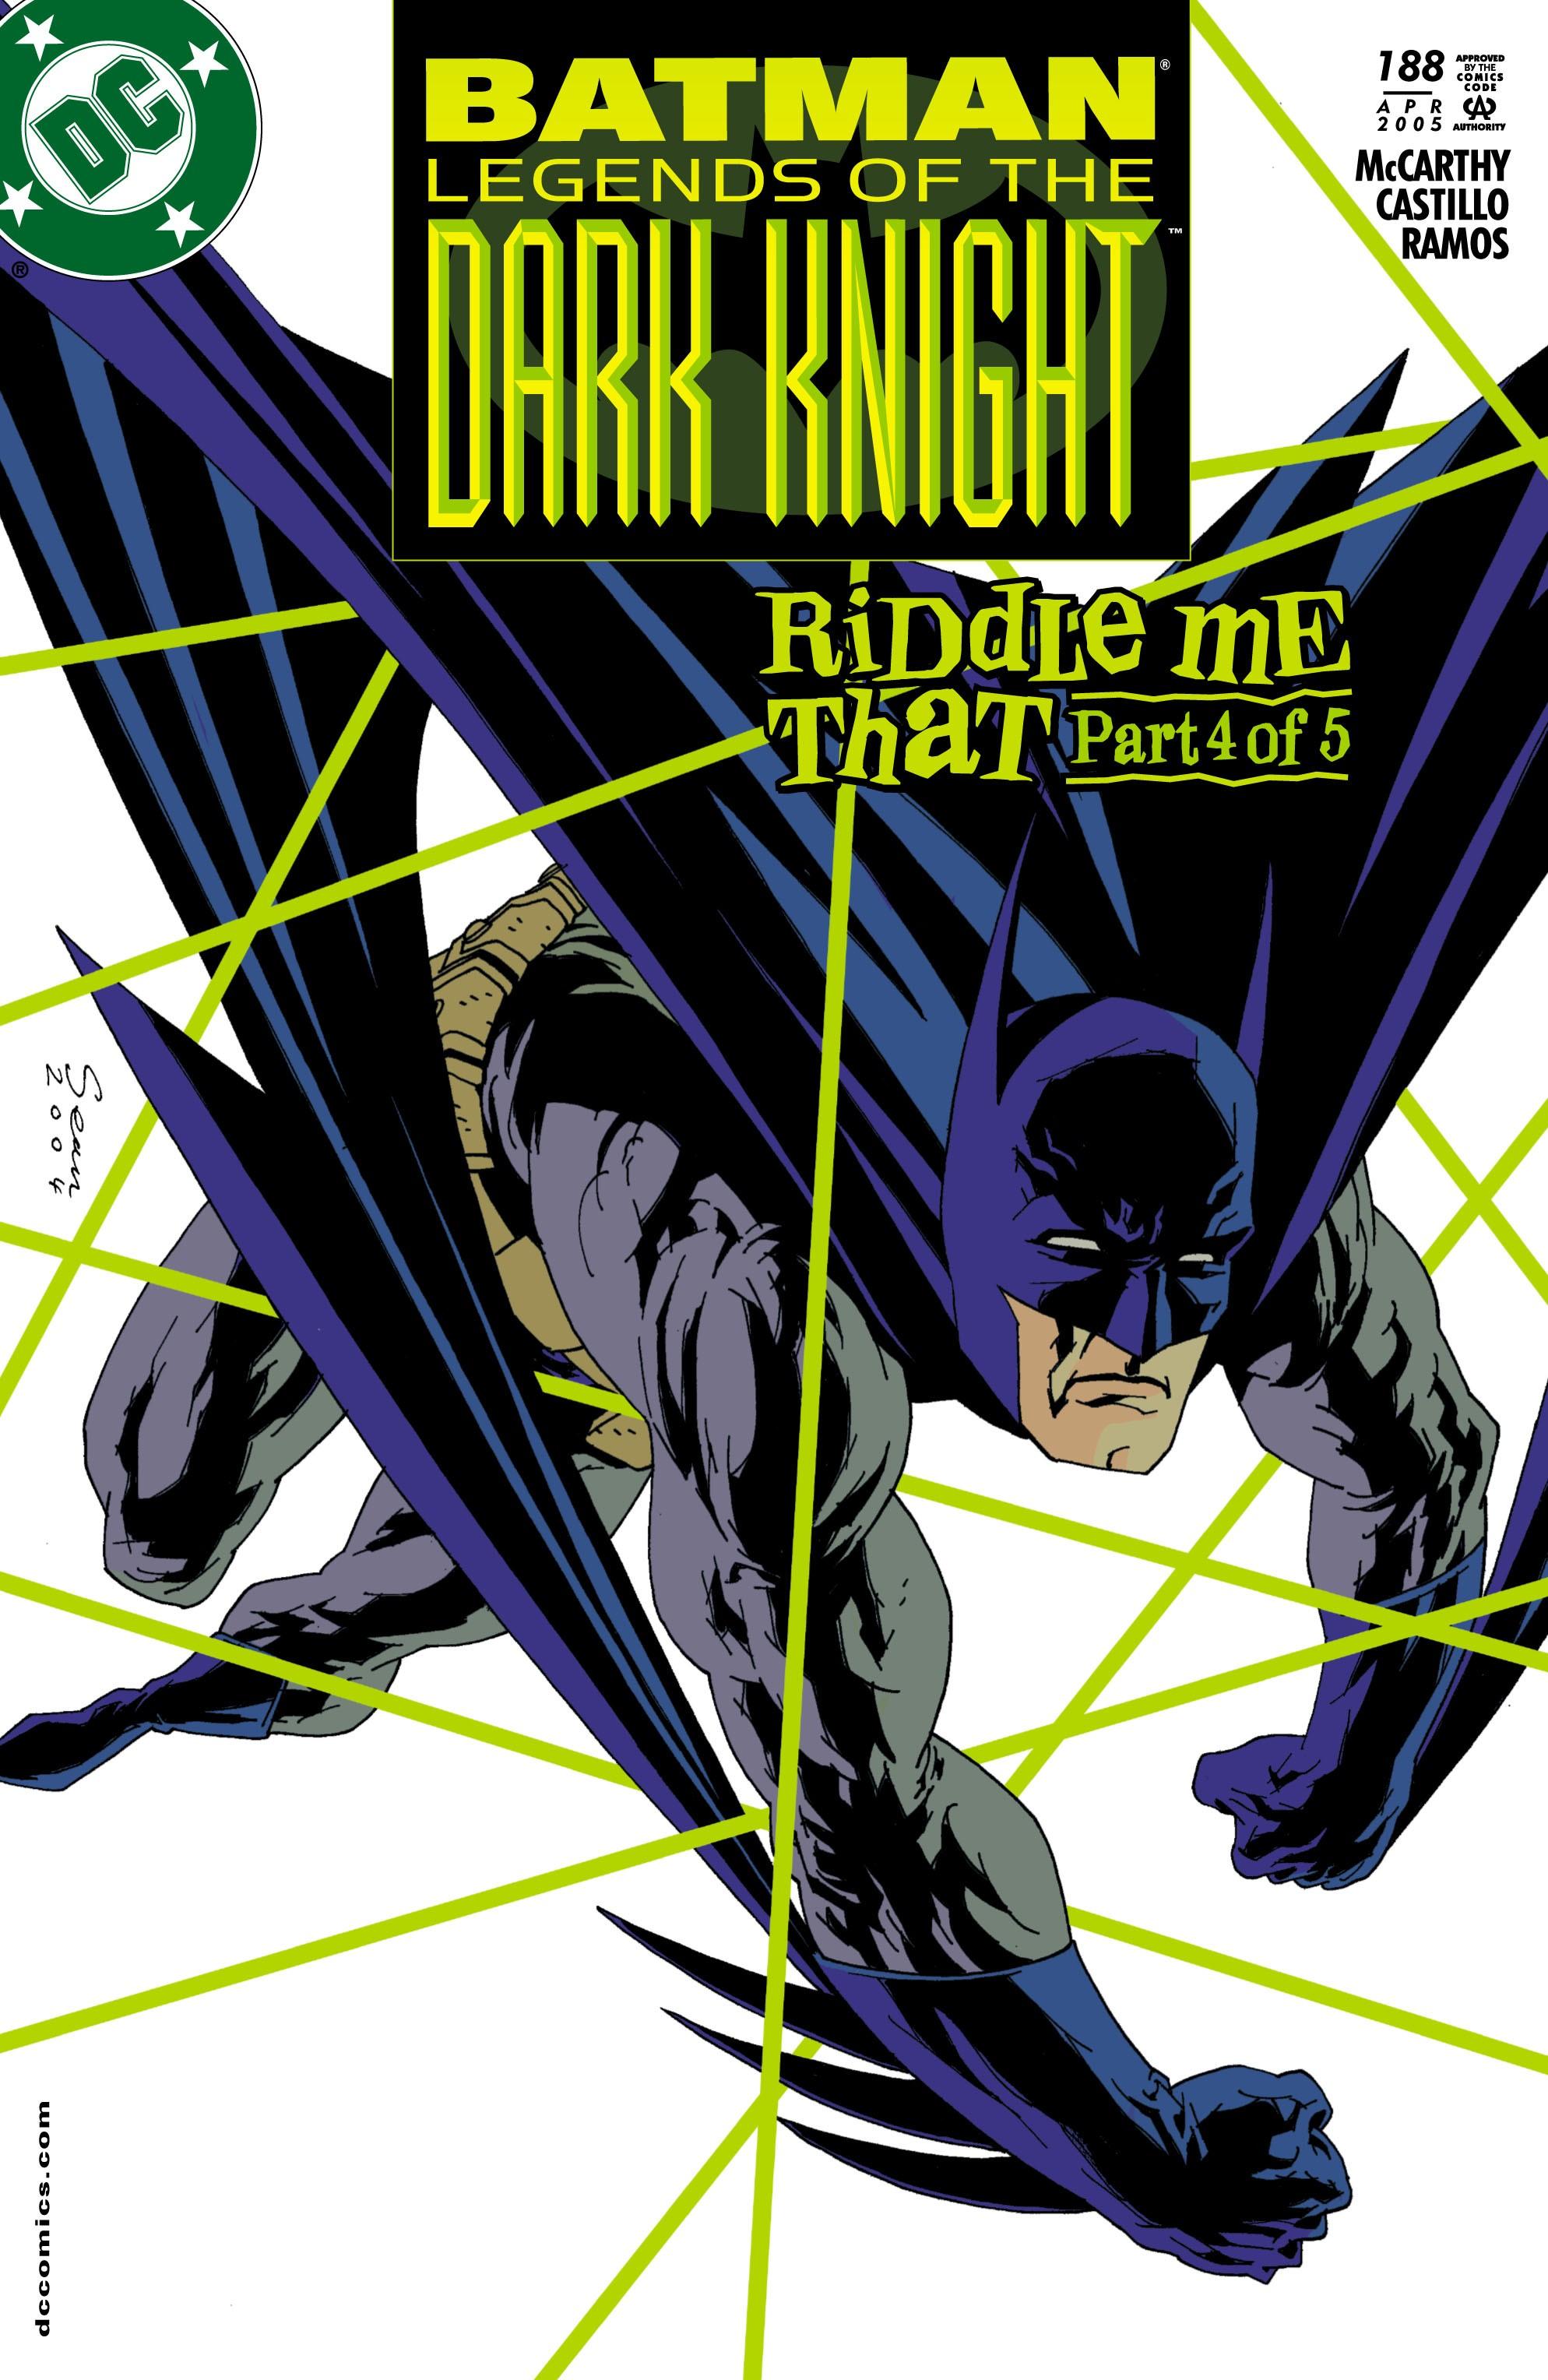 Batman: Legends of the Dark Knight 188 Page 1